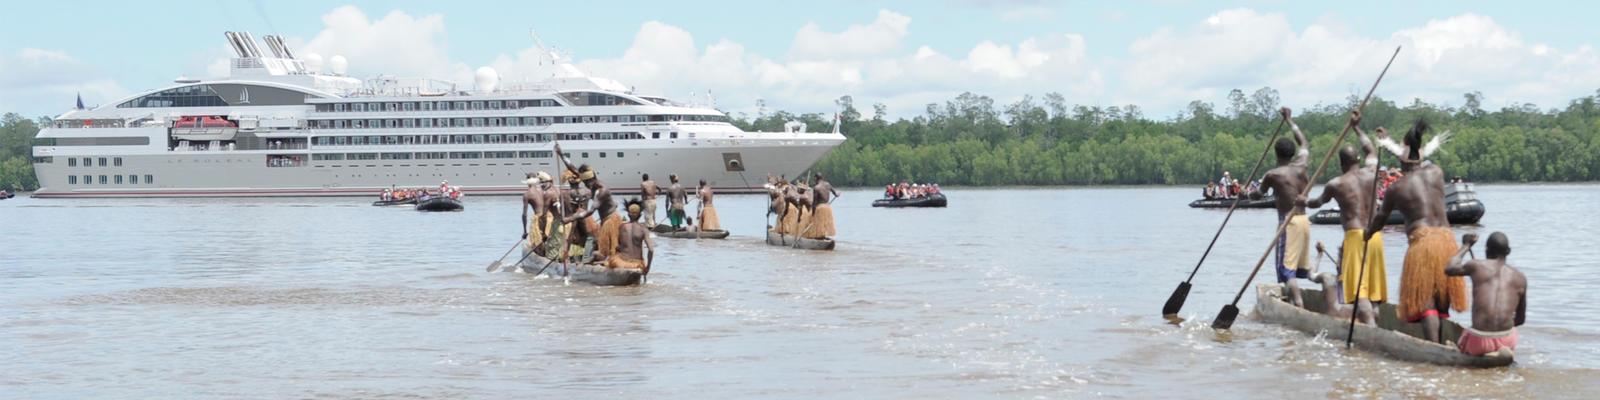 Shore excursion in Papua New Guinea (Photo: Ponant)